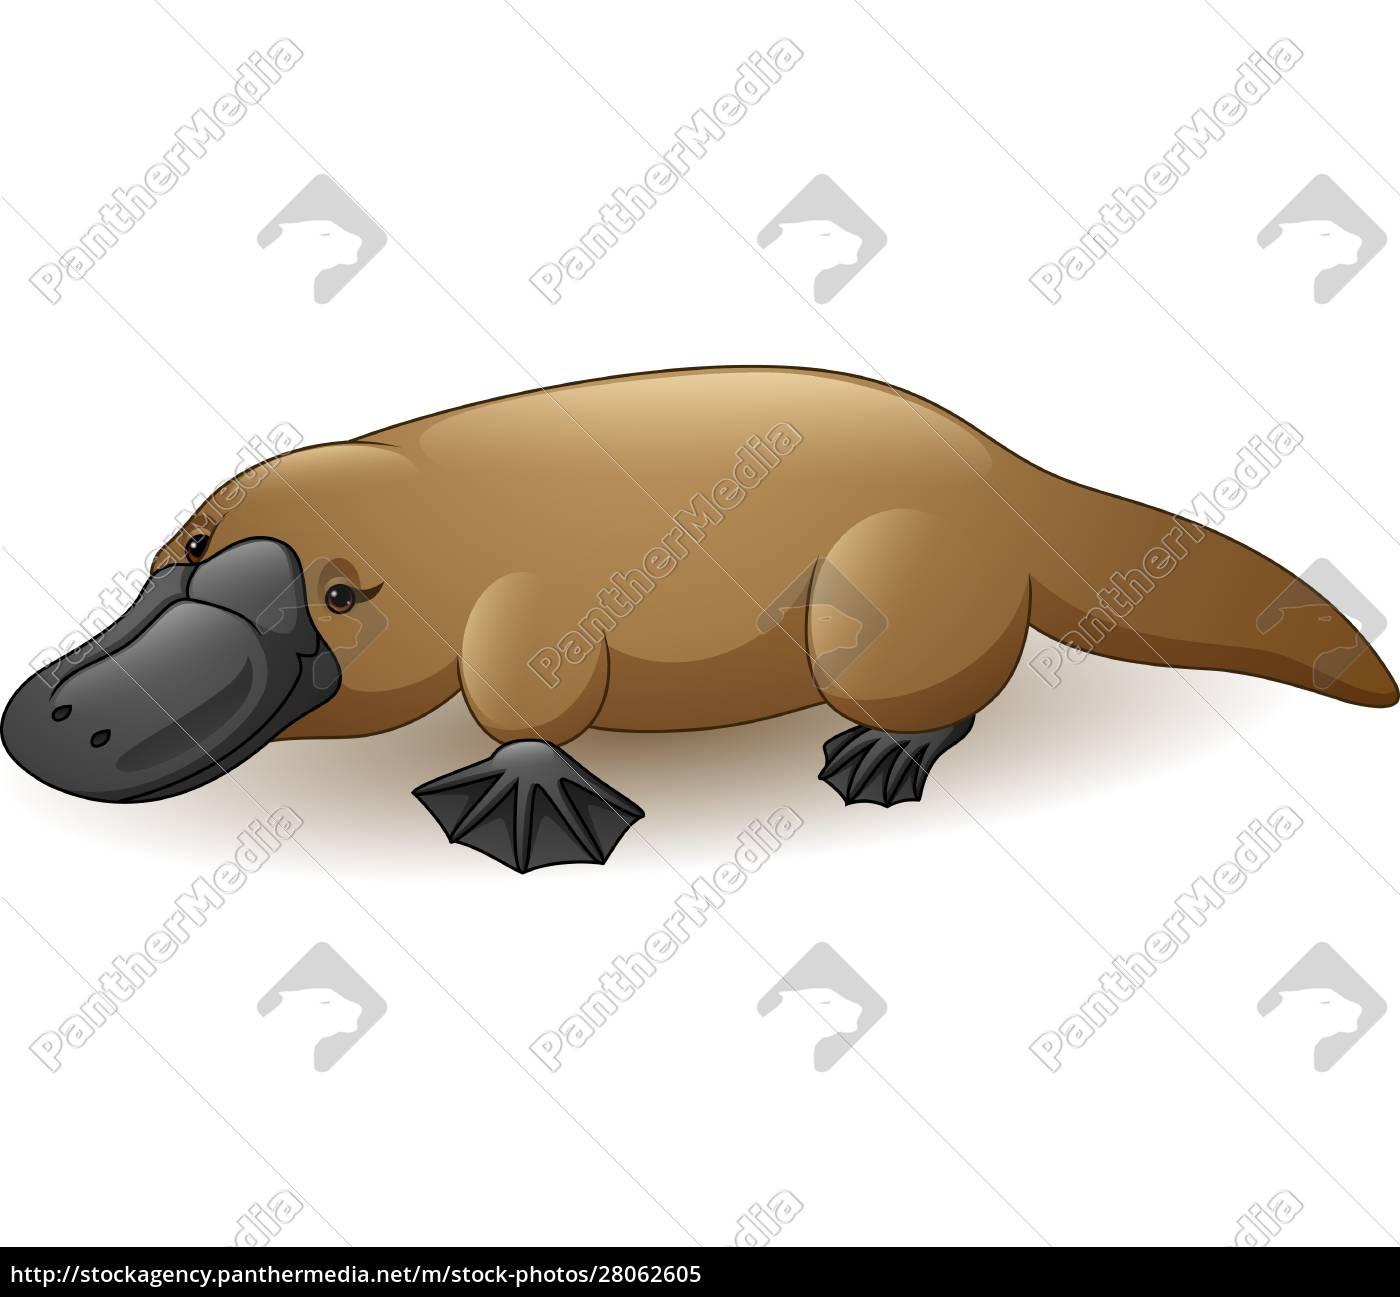 illustration, of, platypus, isolated, on, white - 28062605